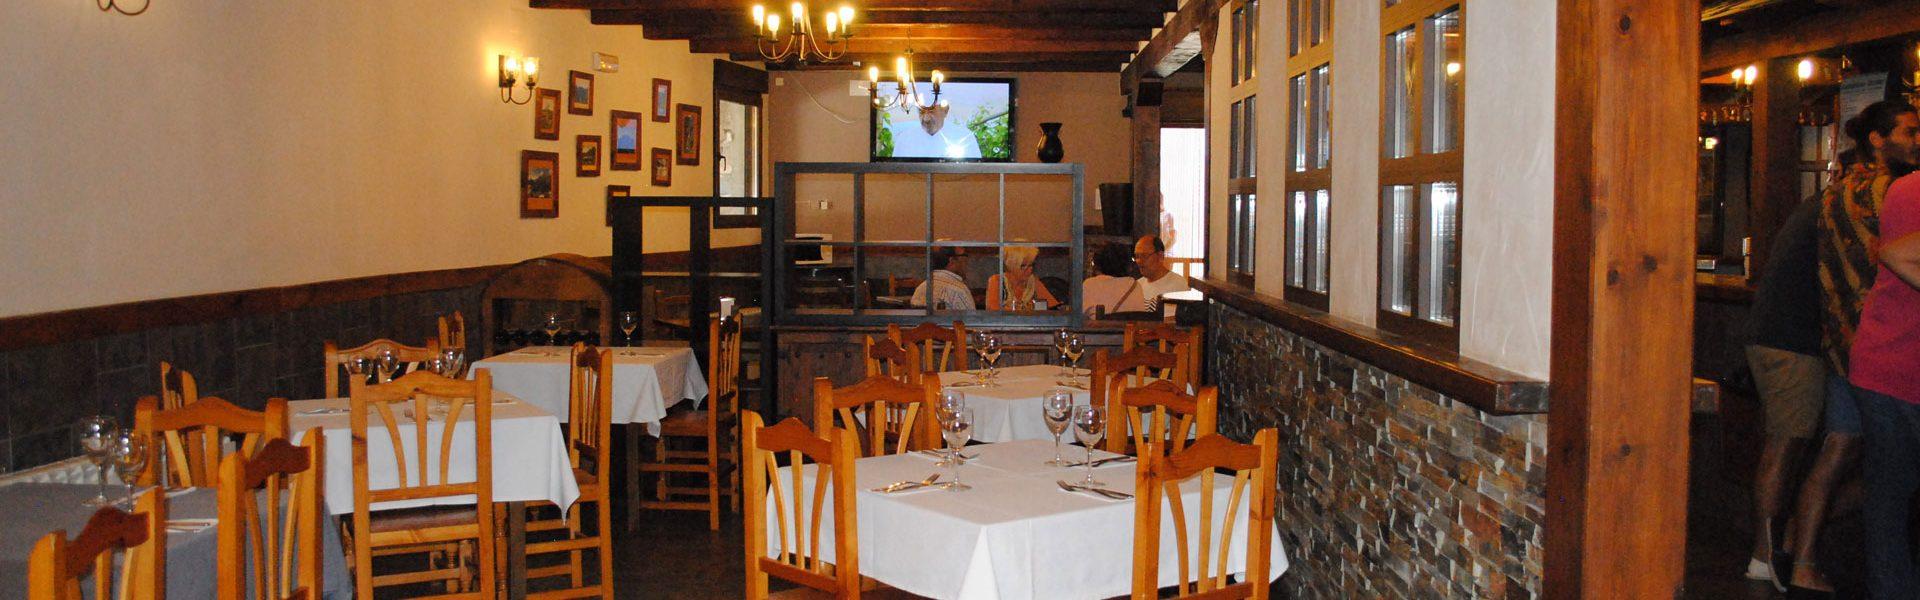 restaurante-despenalagua_11